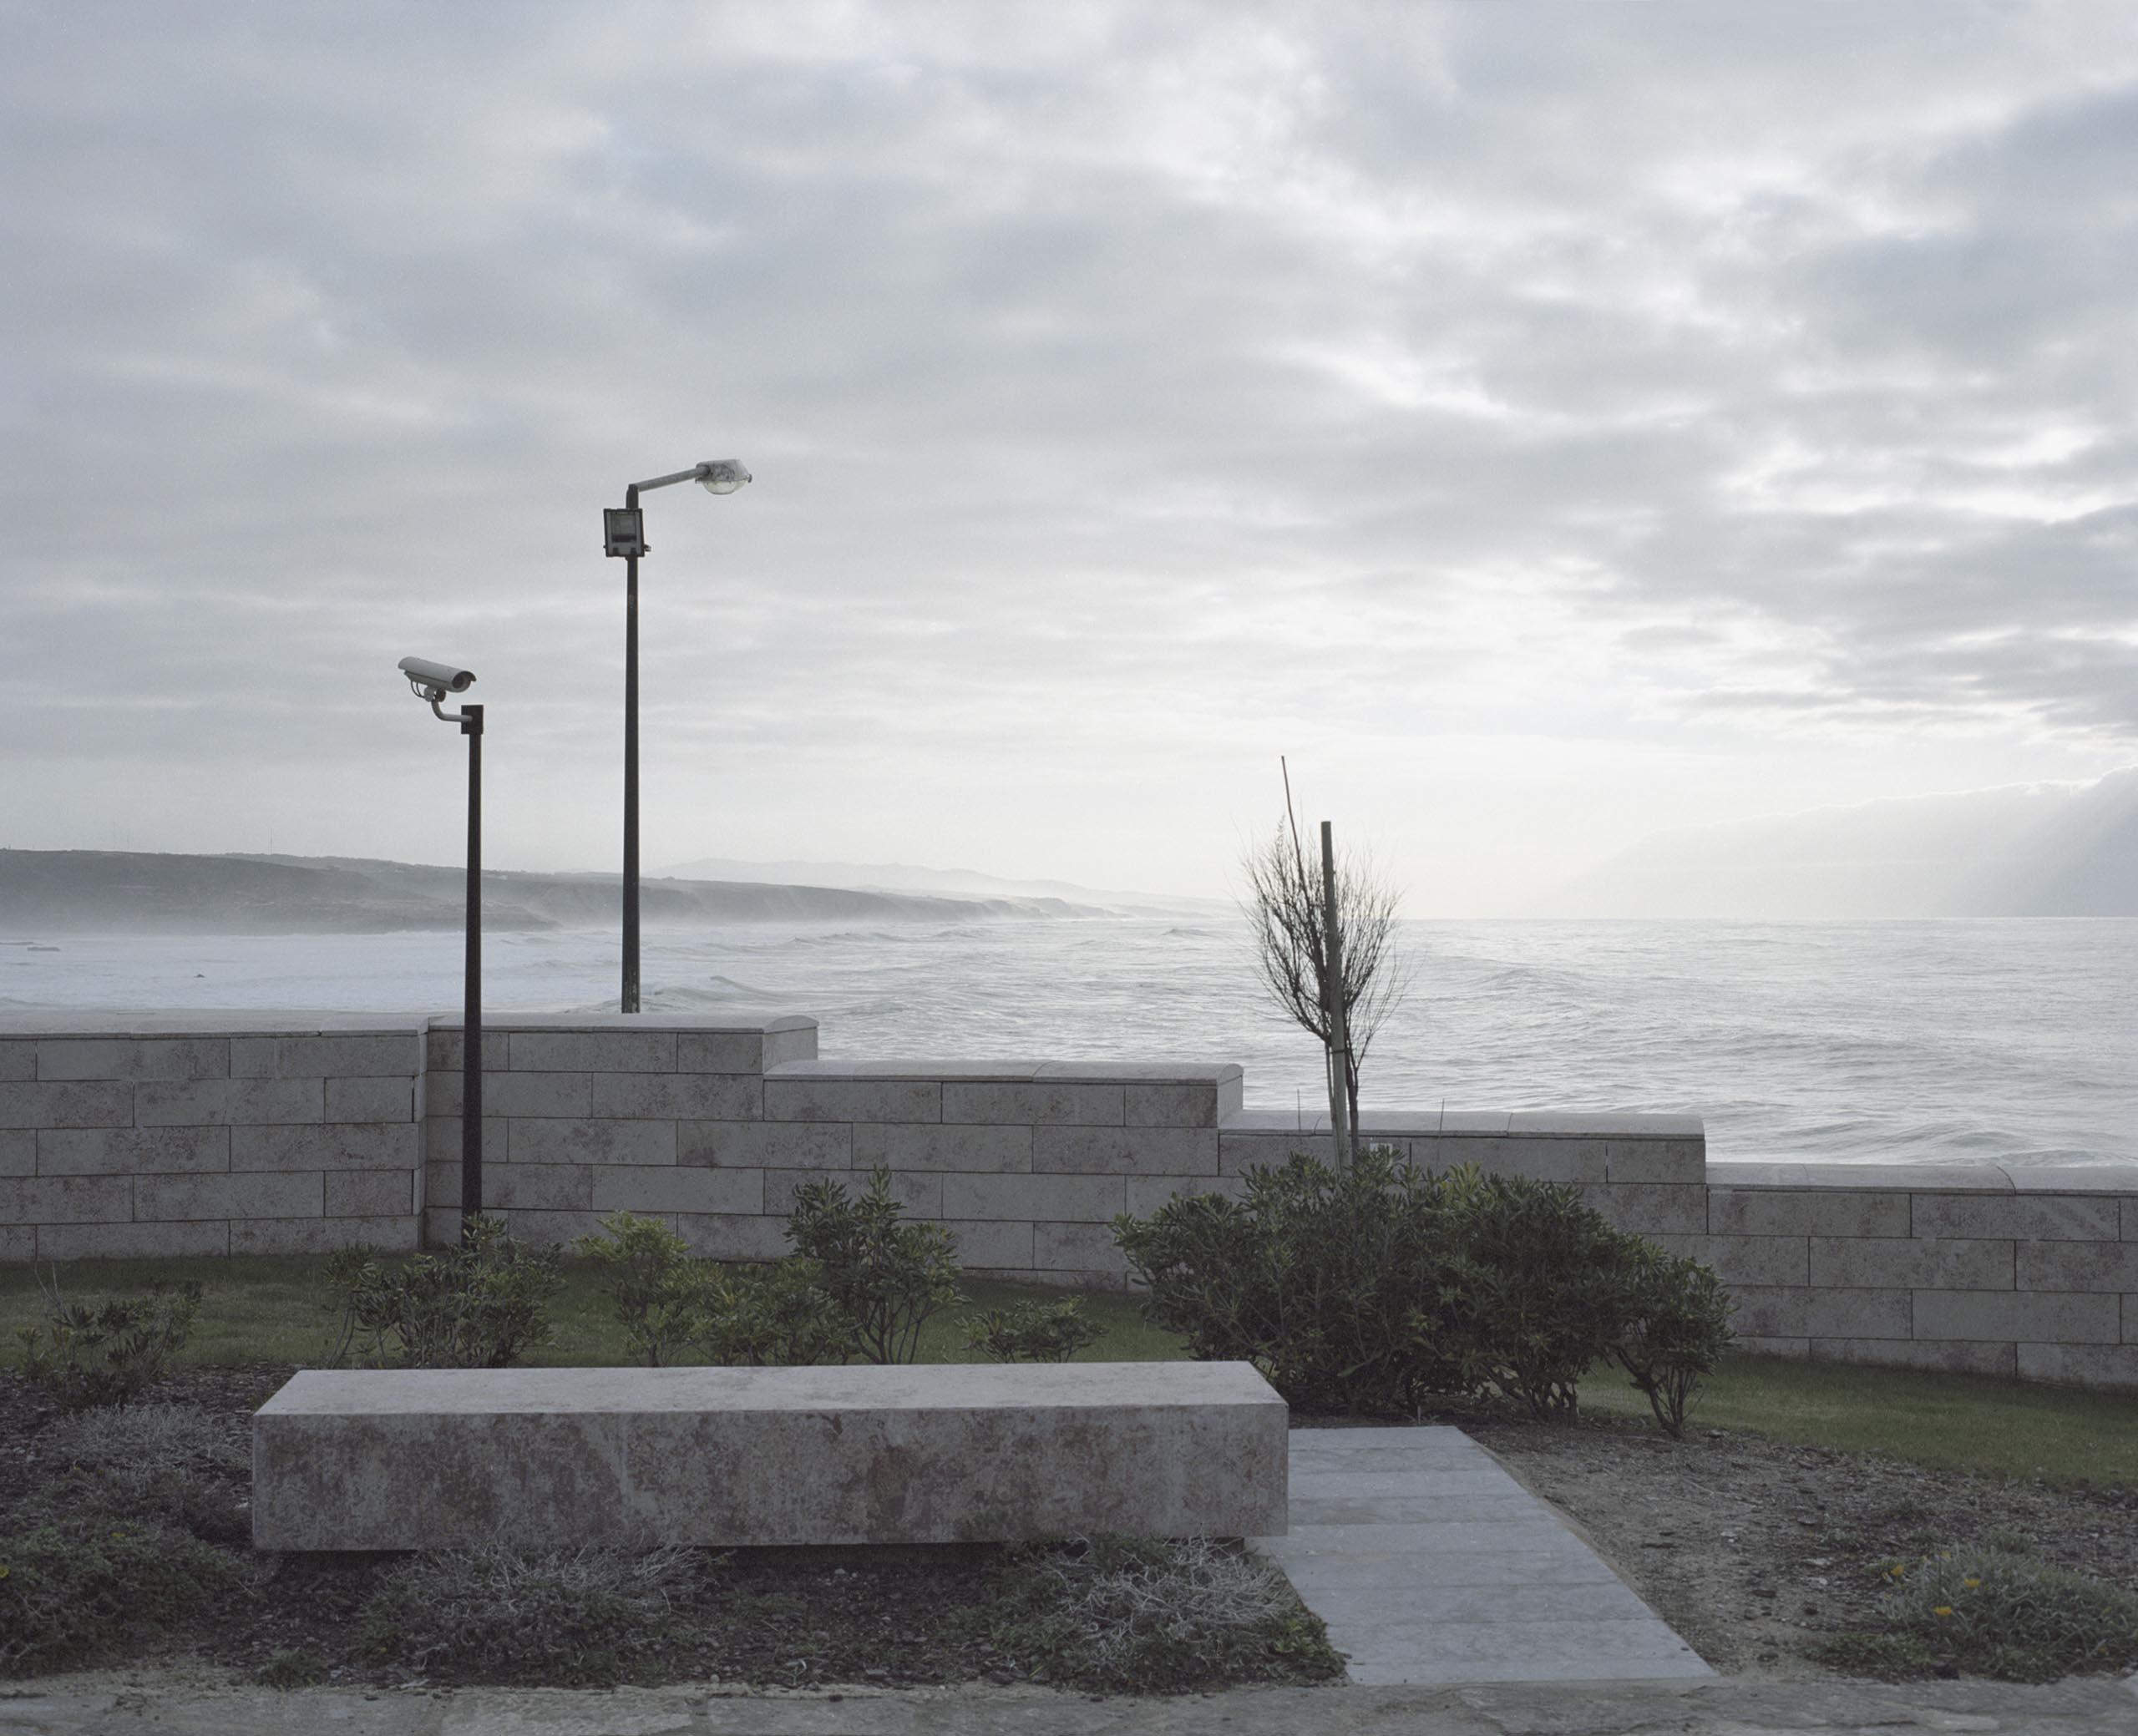 08_PORTUGAL_2012_08